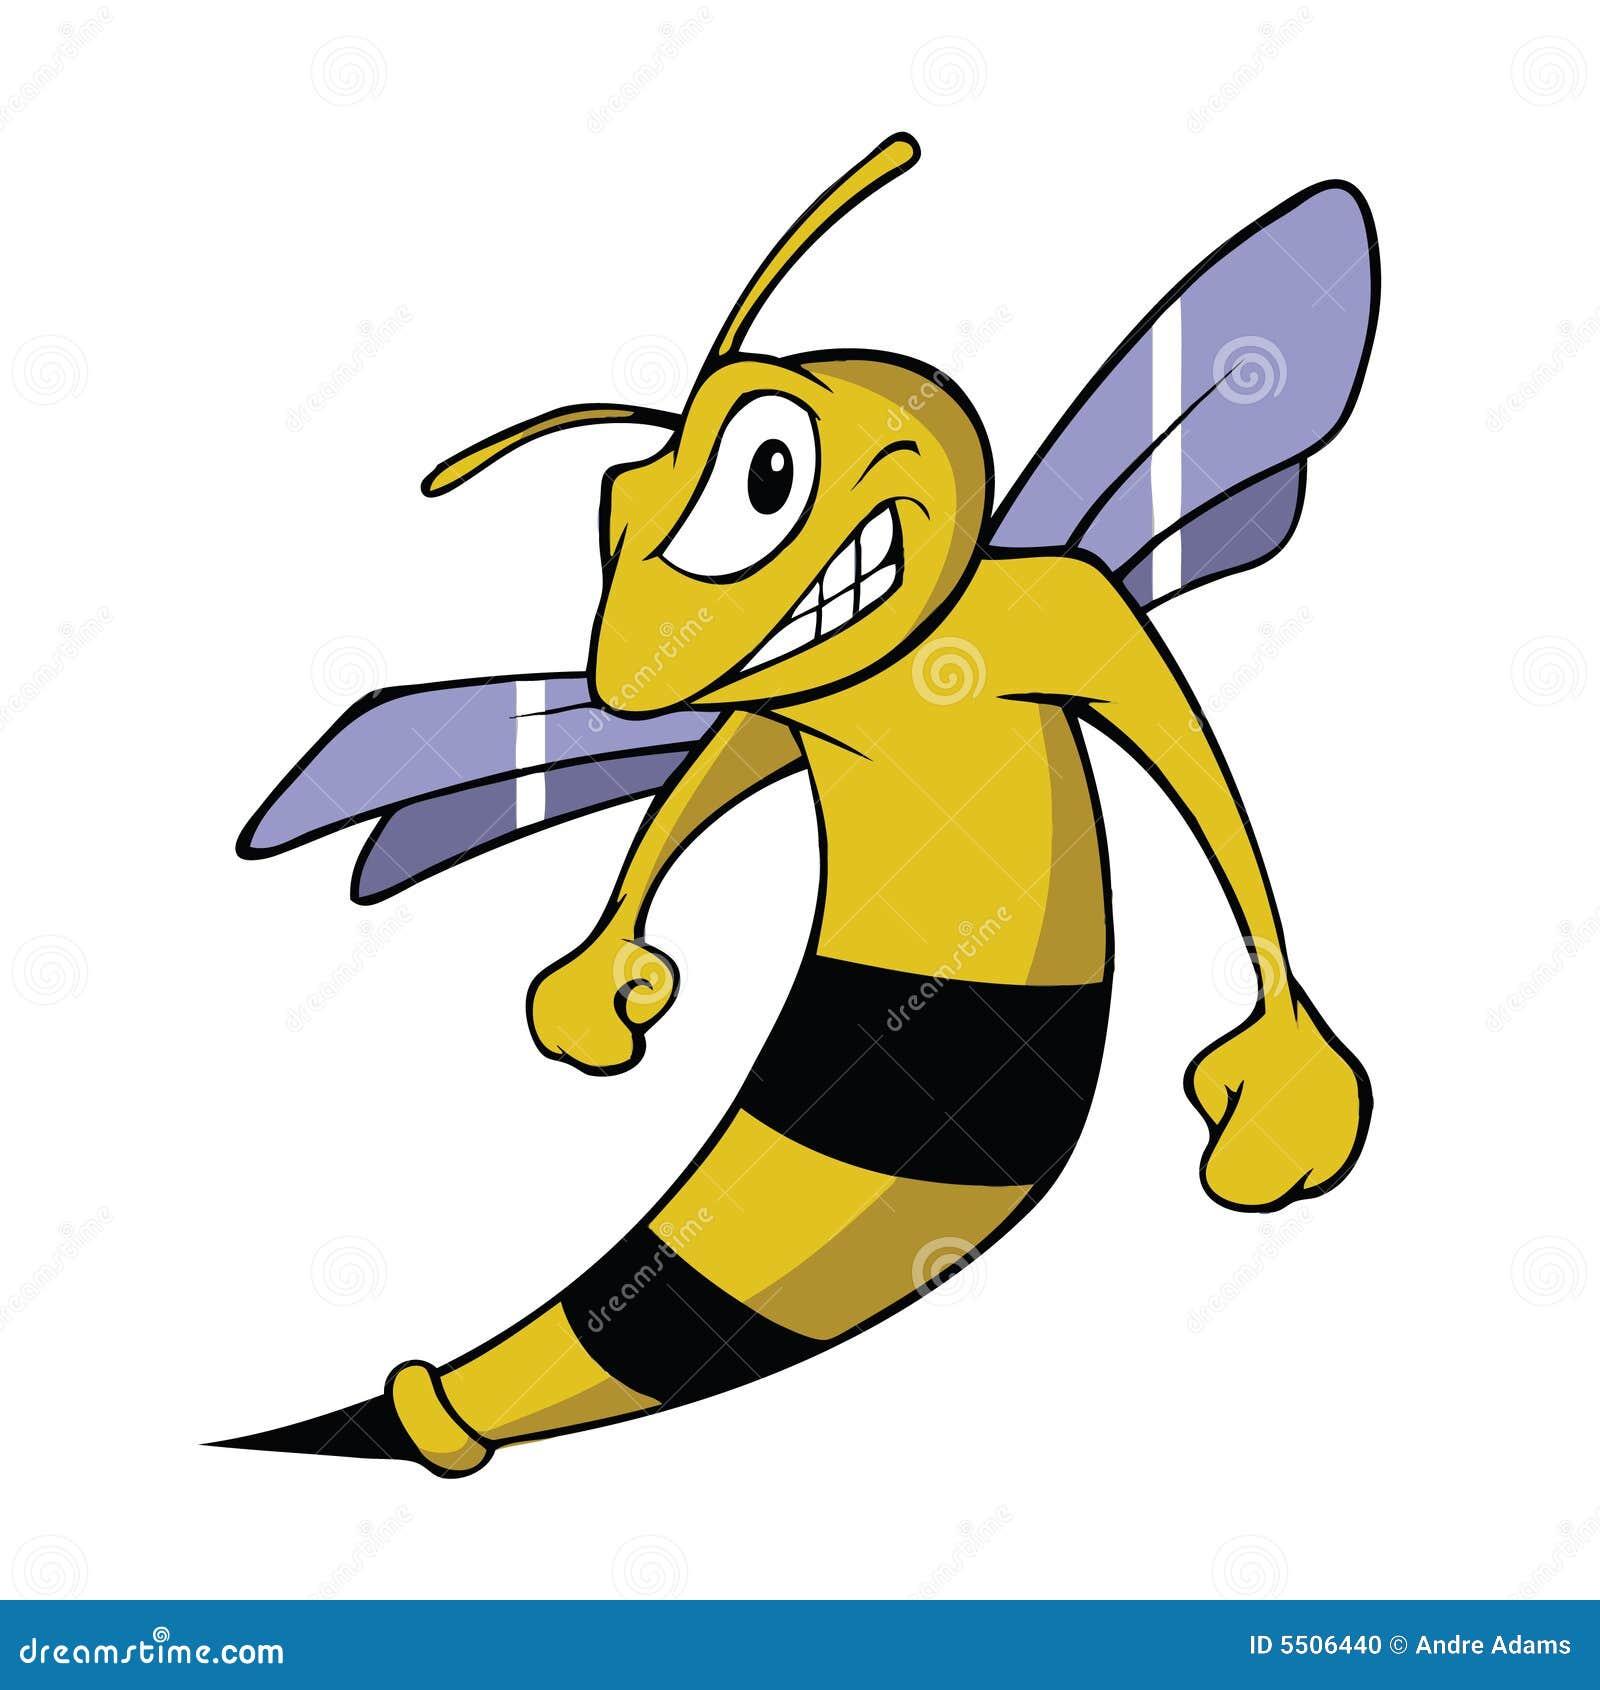 Hornet Stock Photo - Image: 5506440